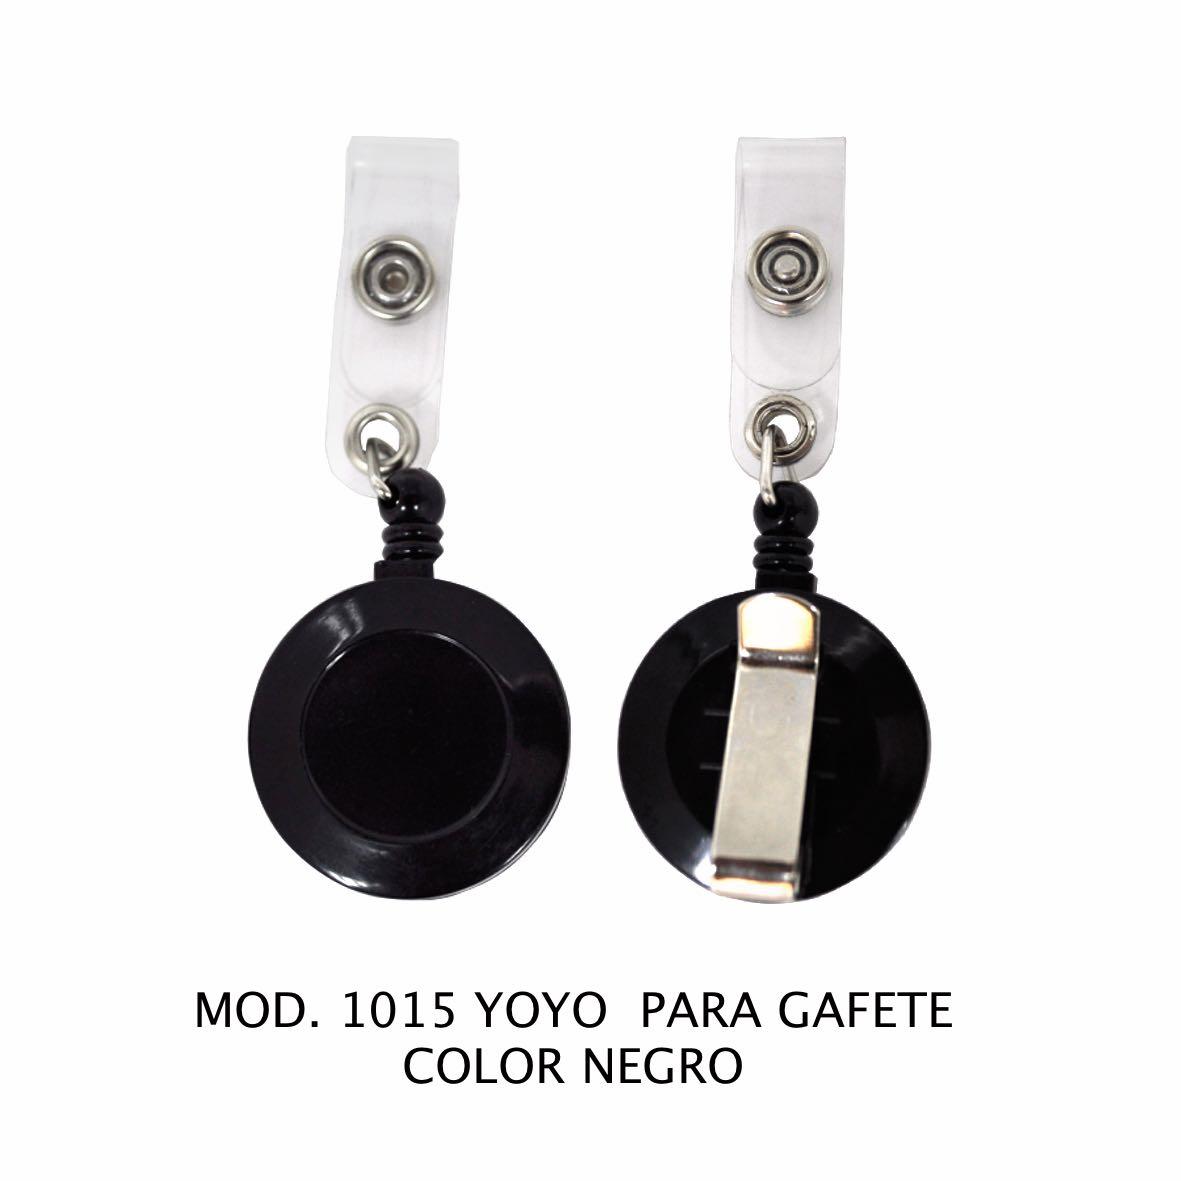 Yoyo para Gafete Color Negro Modelo 1015 - Sablón